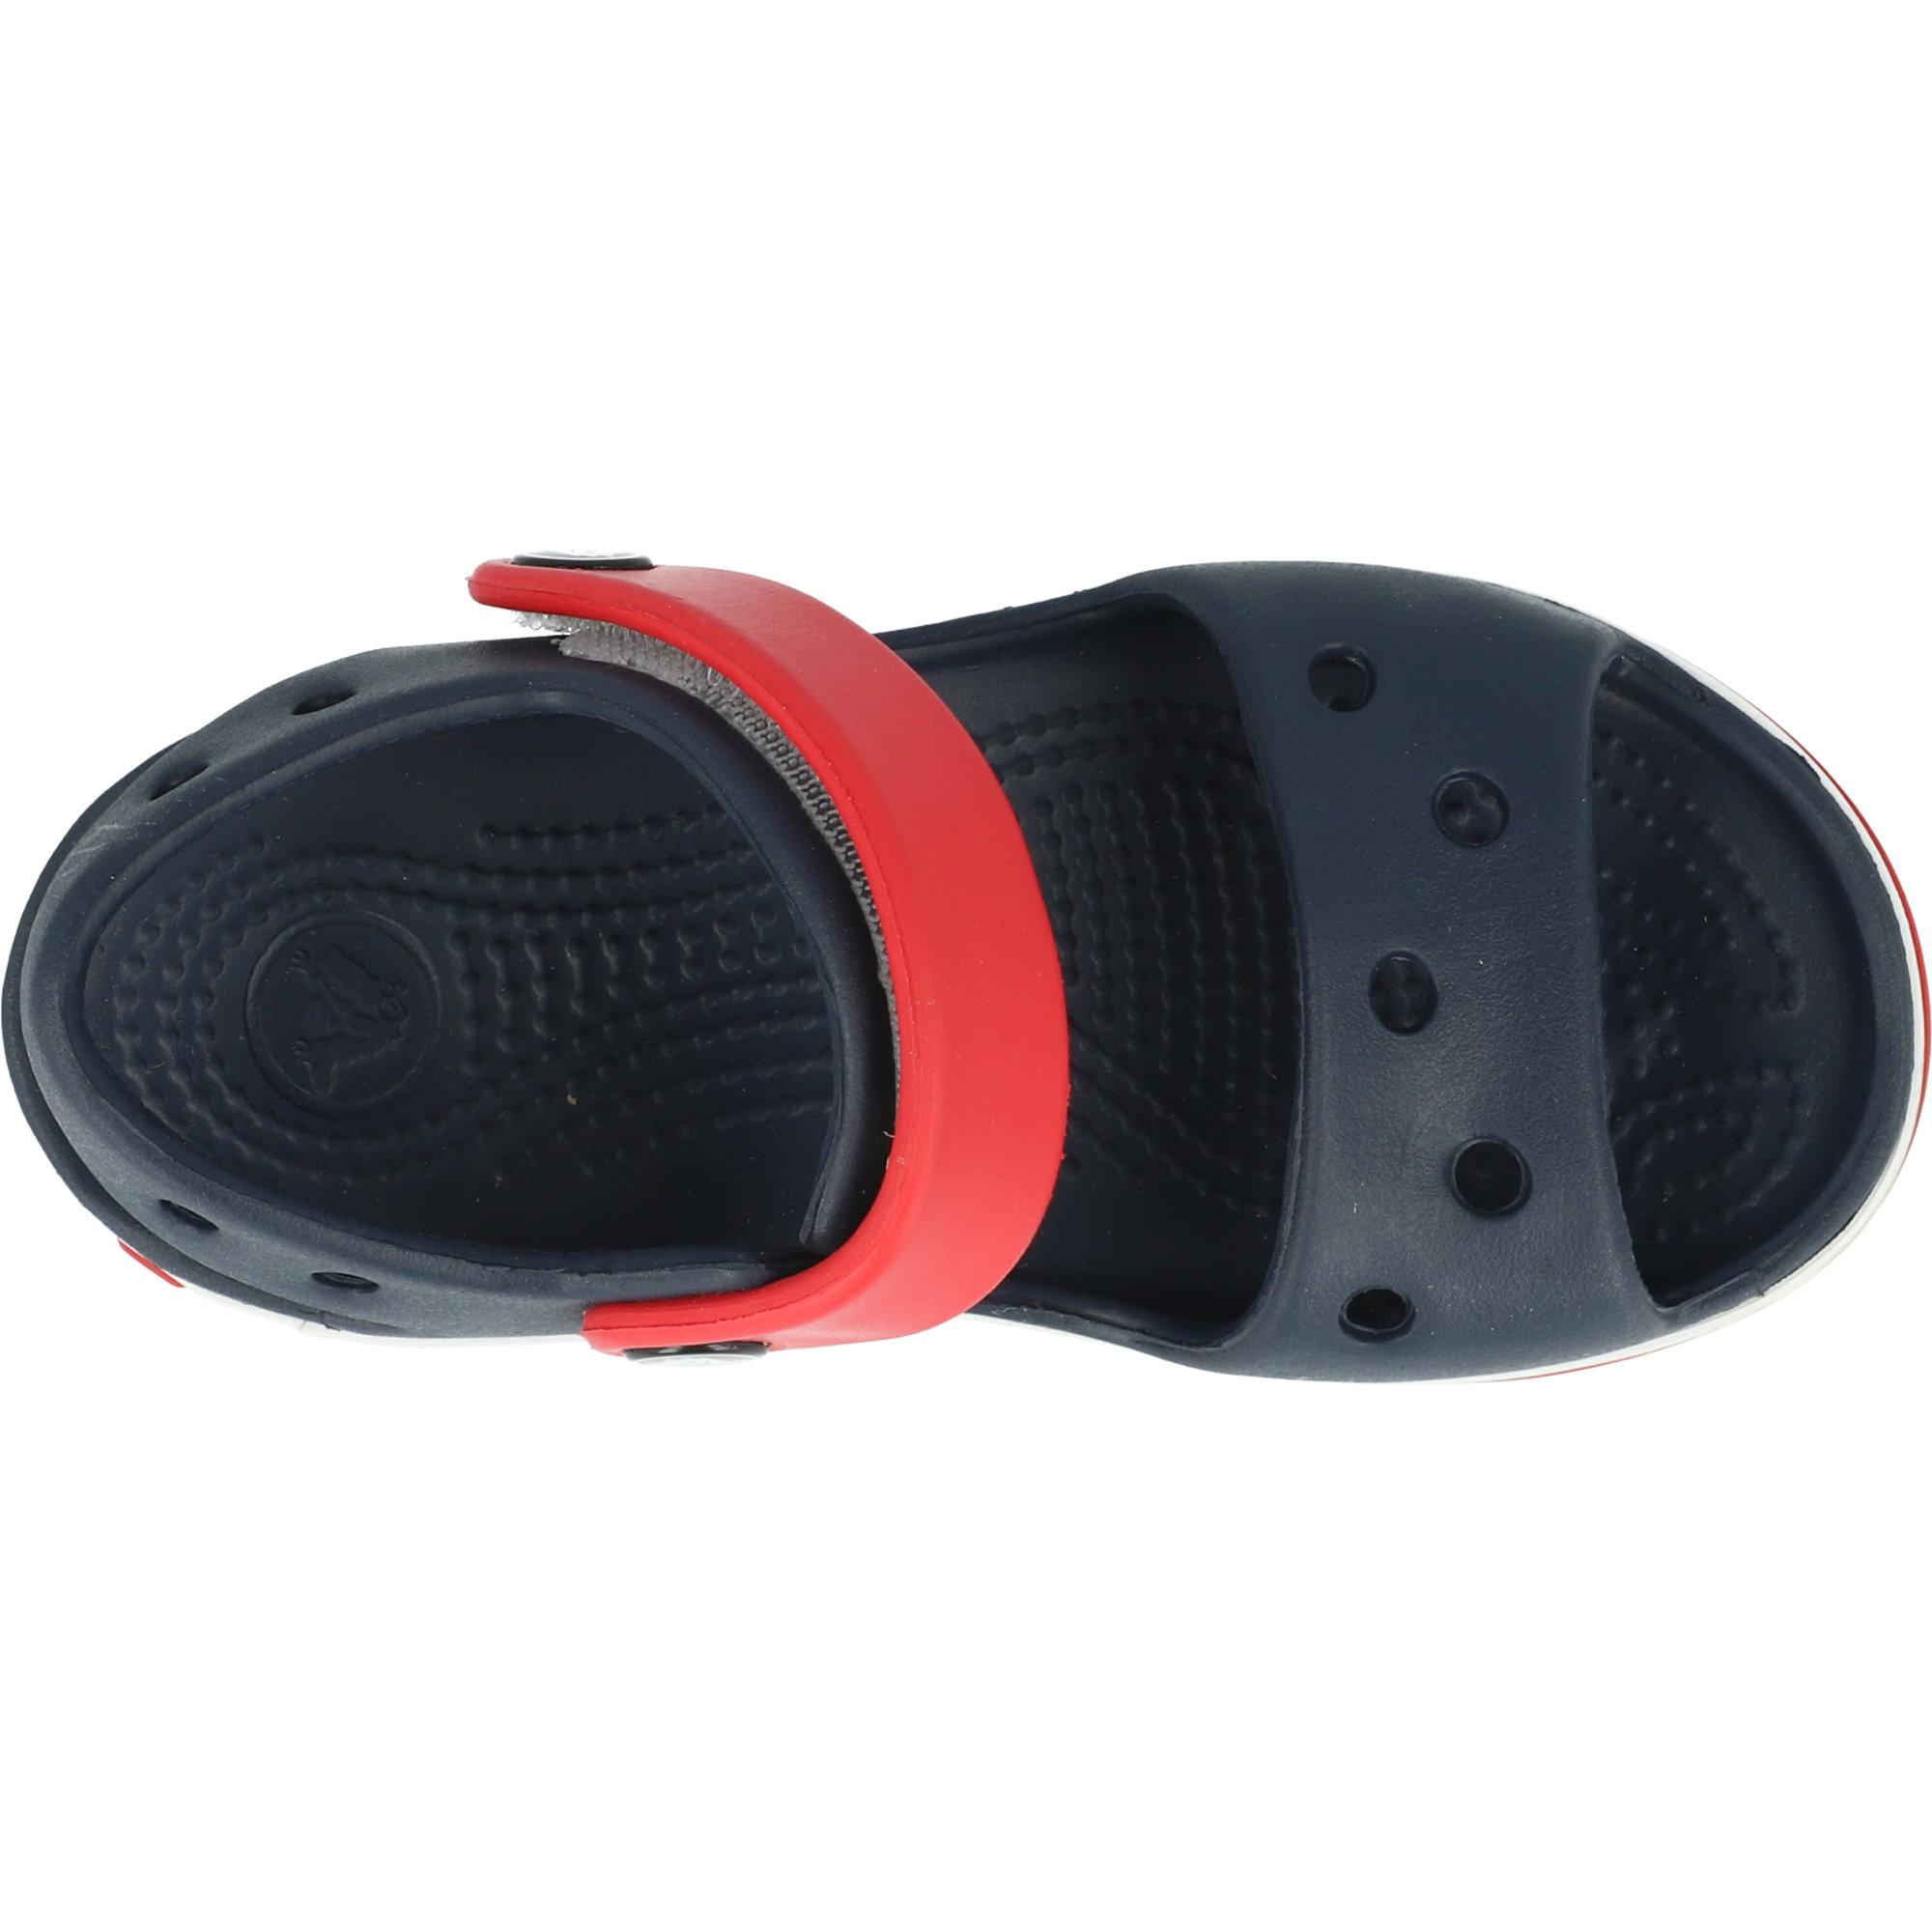 Crocs Kids Crocband Sandal Navy/Red Croslite